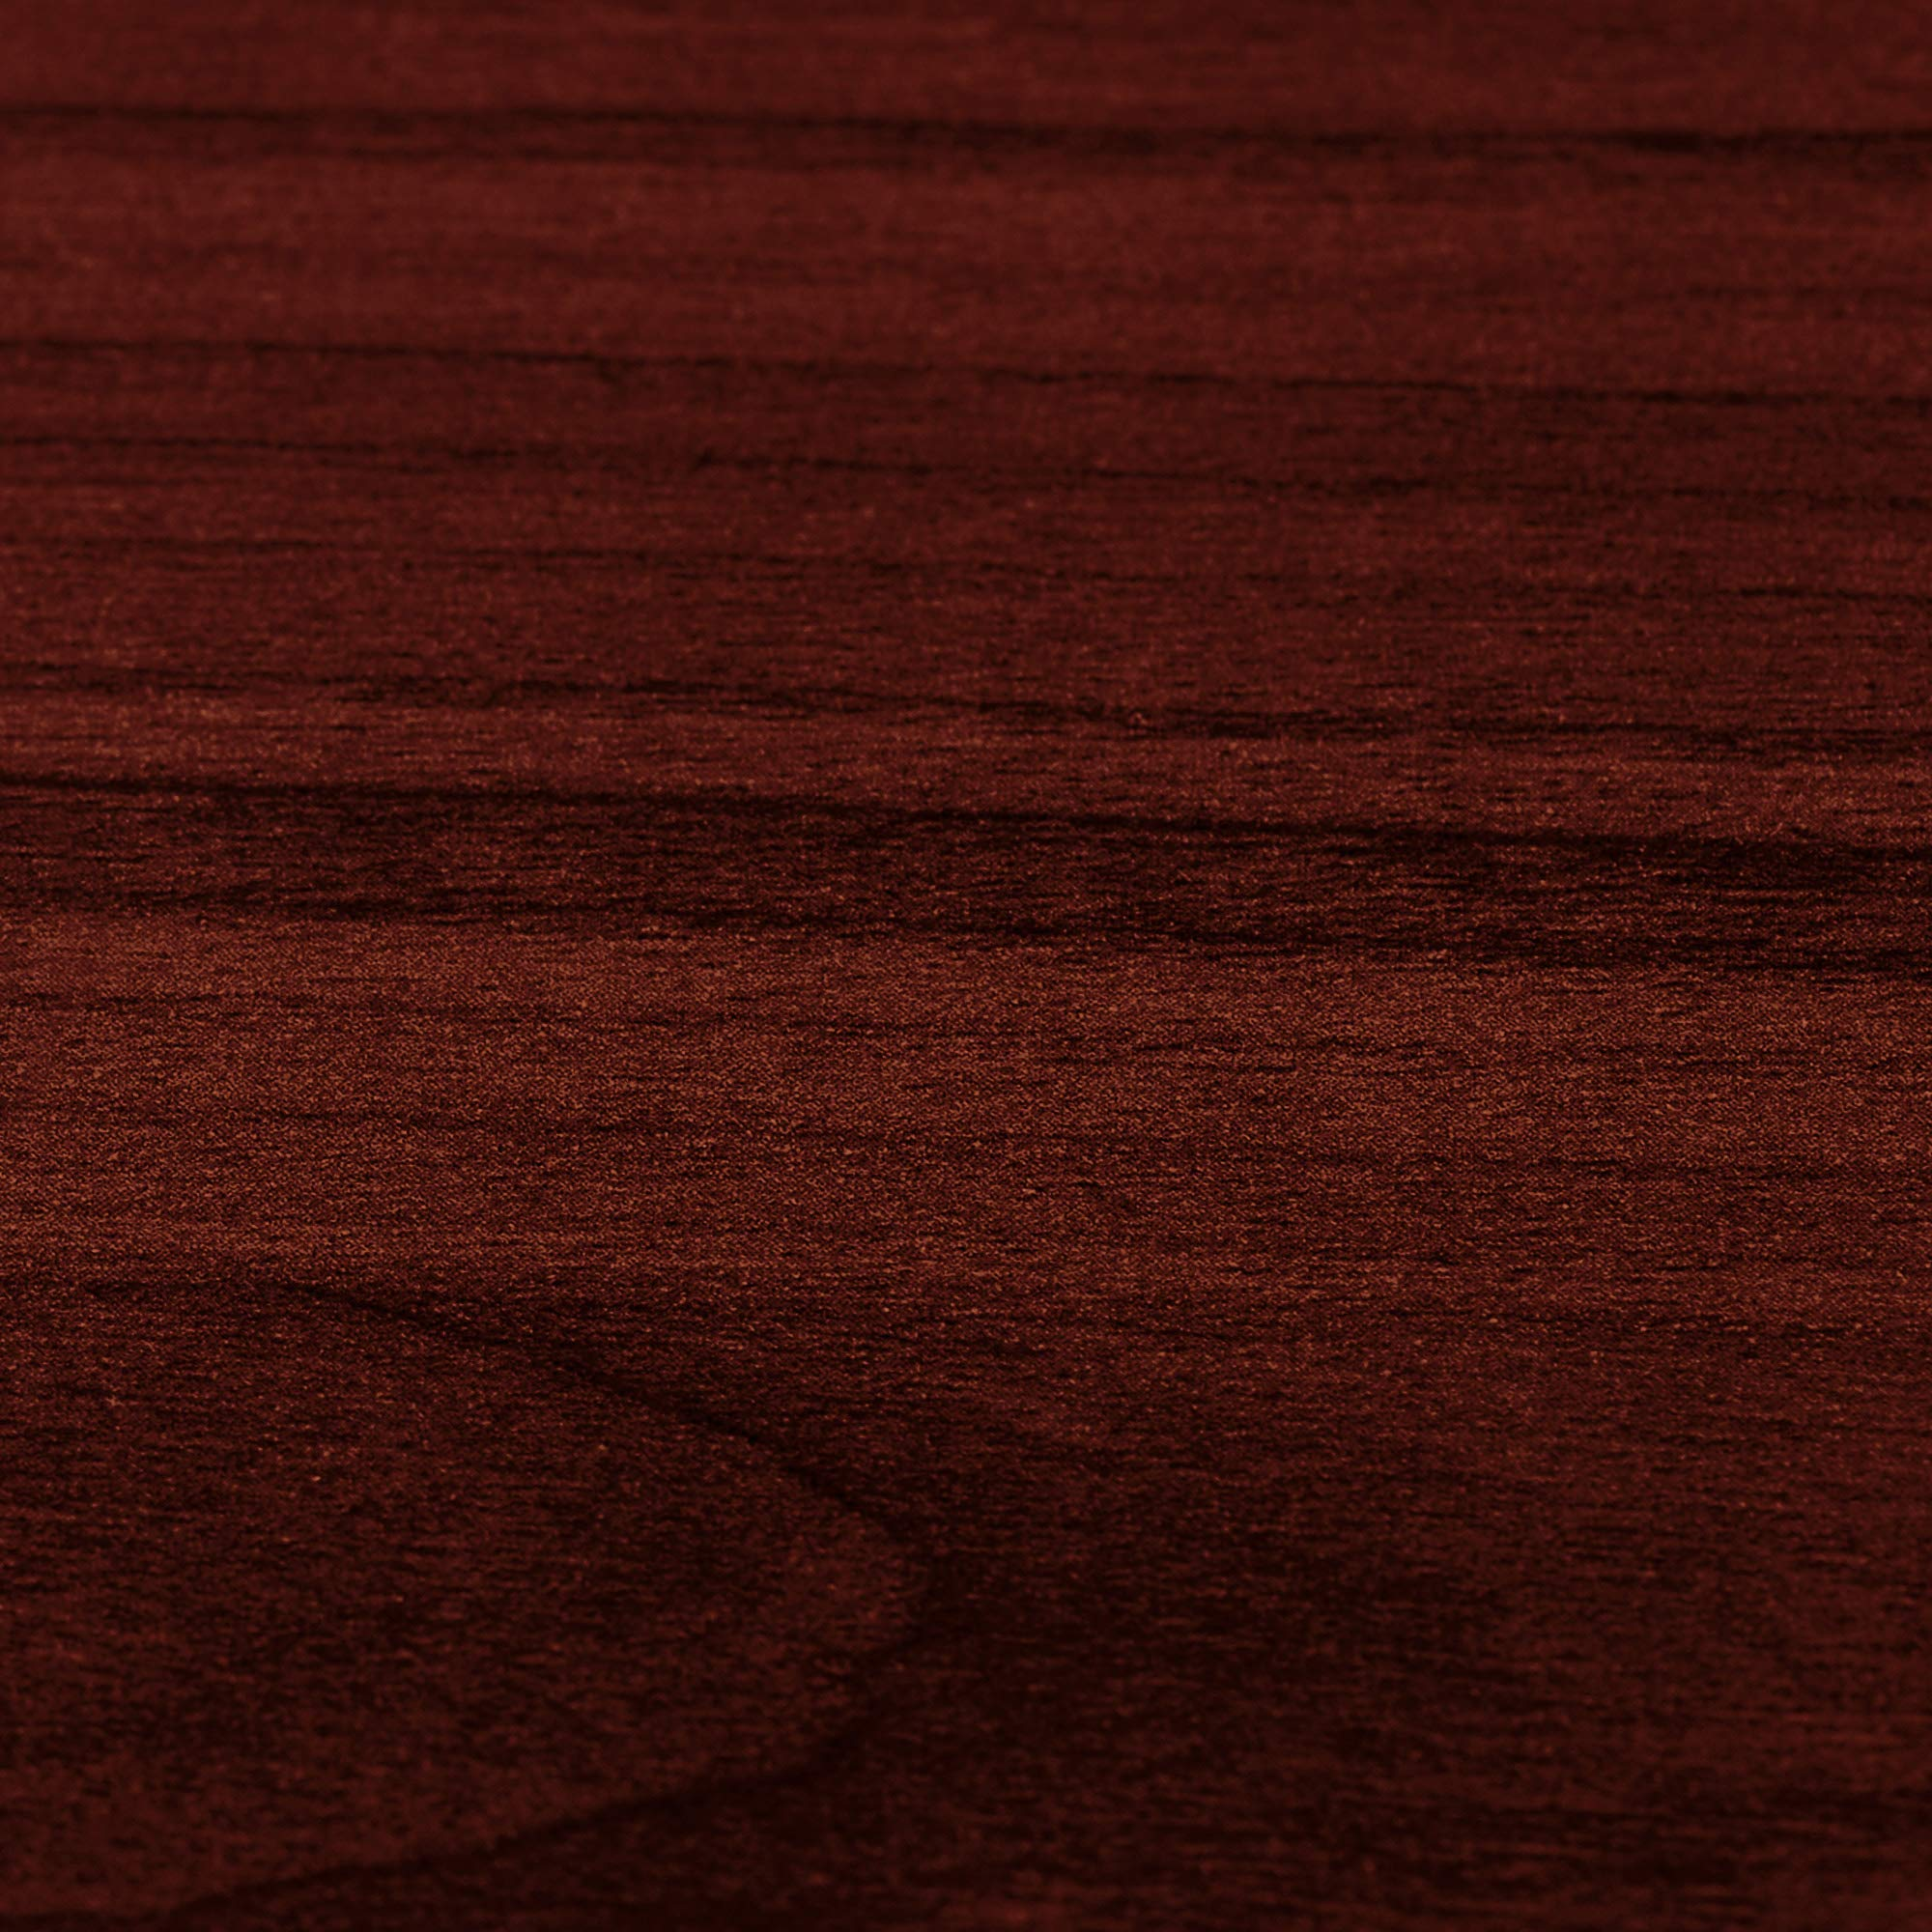 Lorell LLRPMC4814MY Prominence 2.0 Mahogany Laminate Countertop Reception Desk